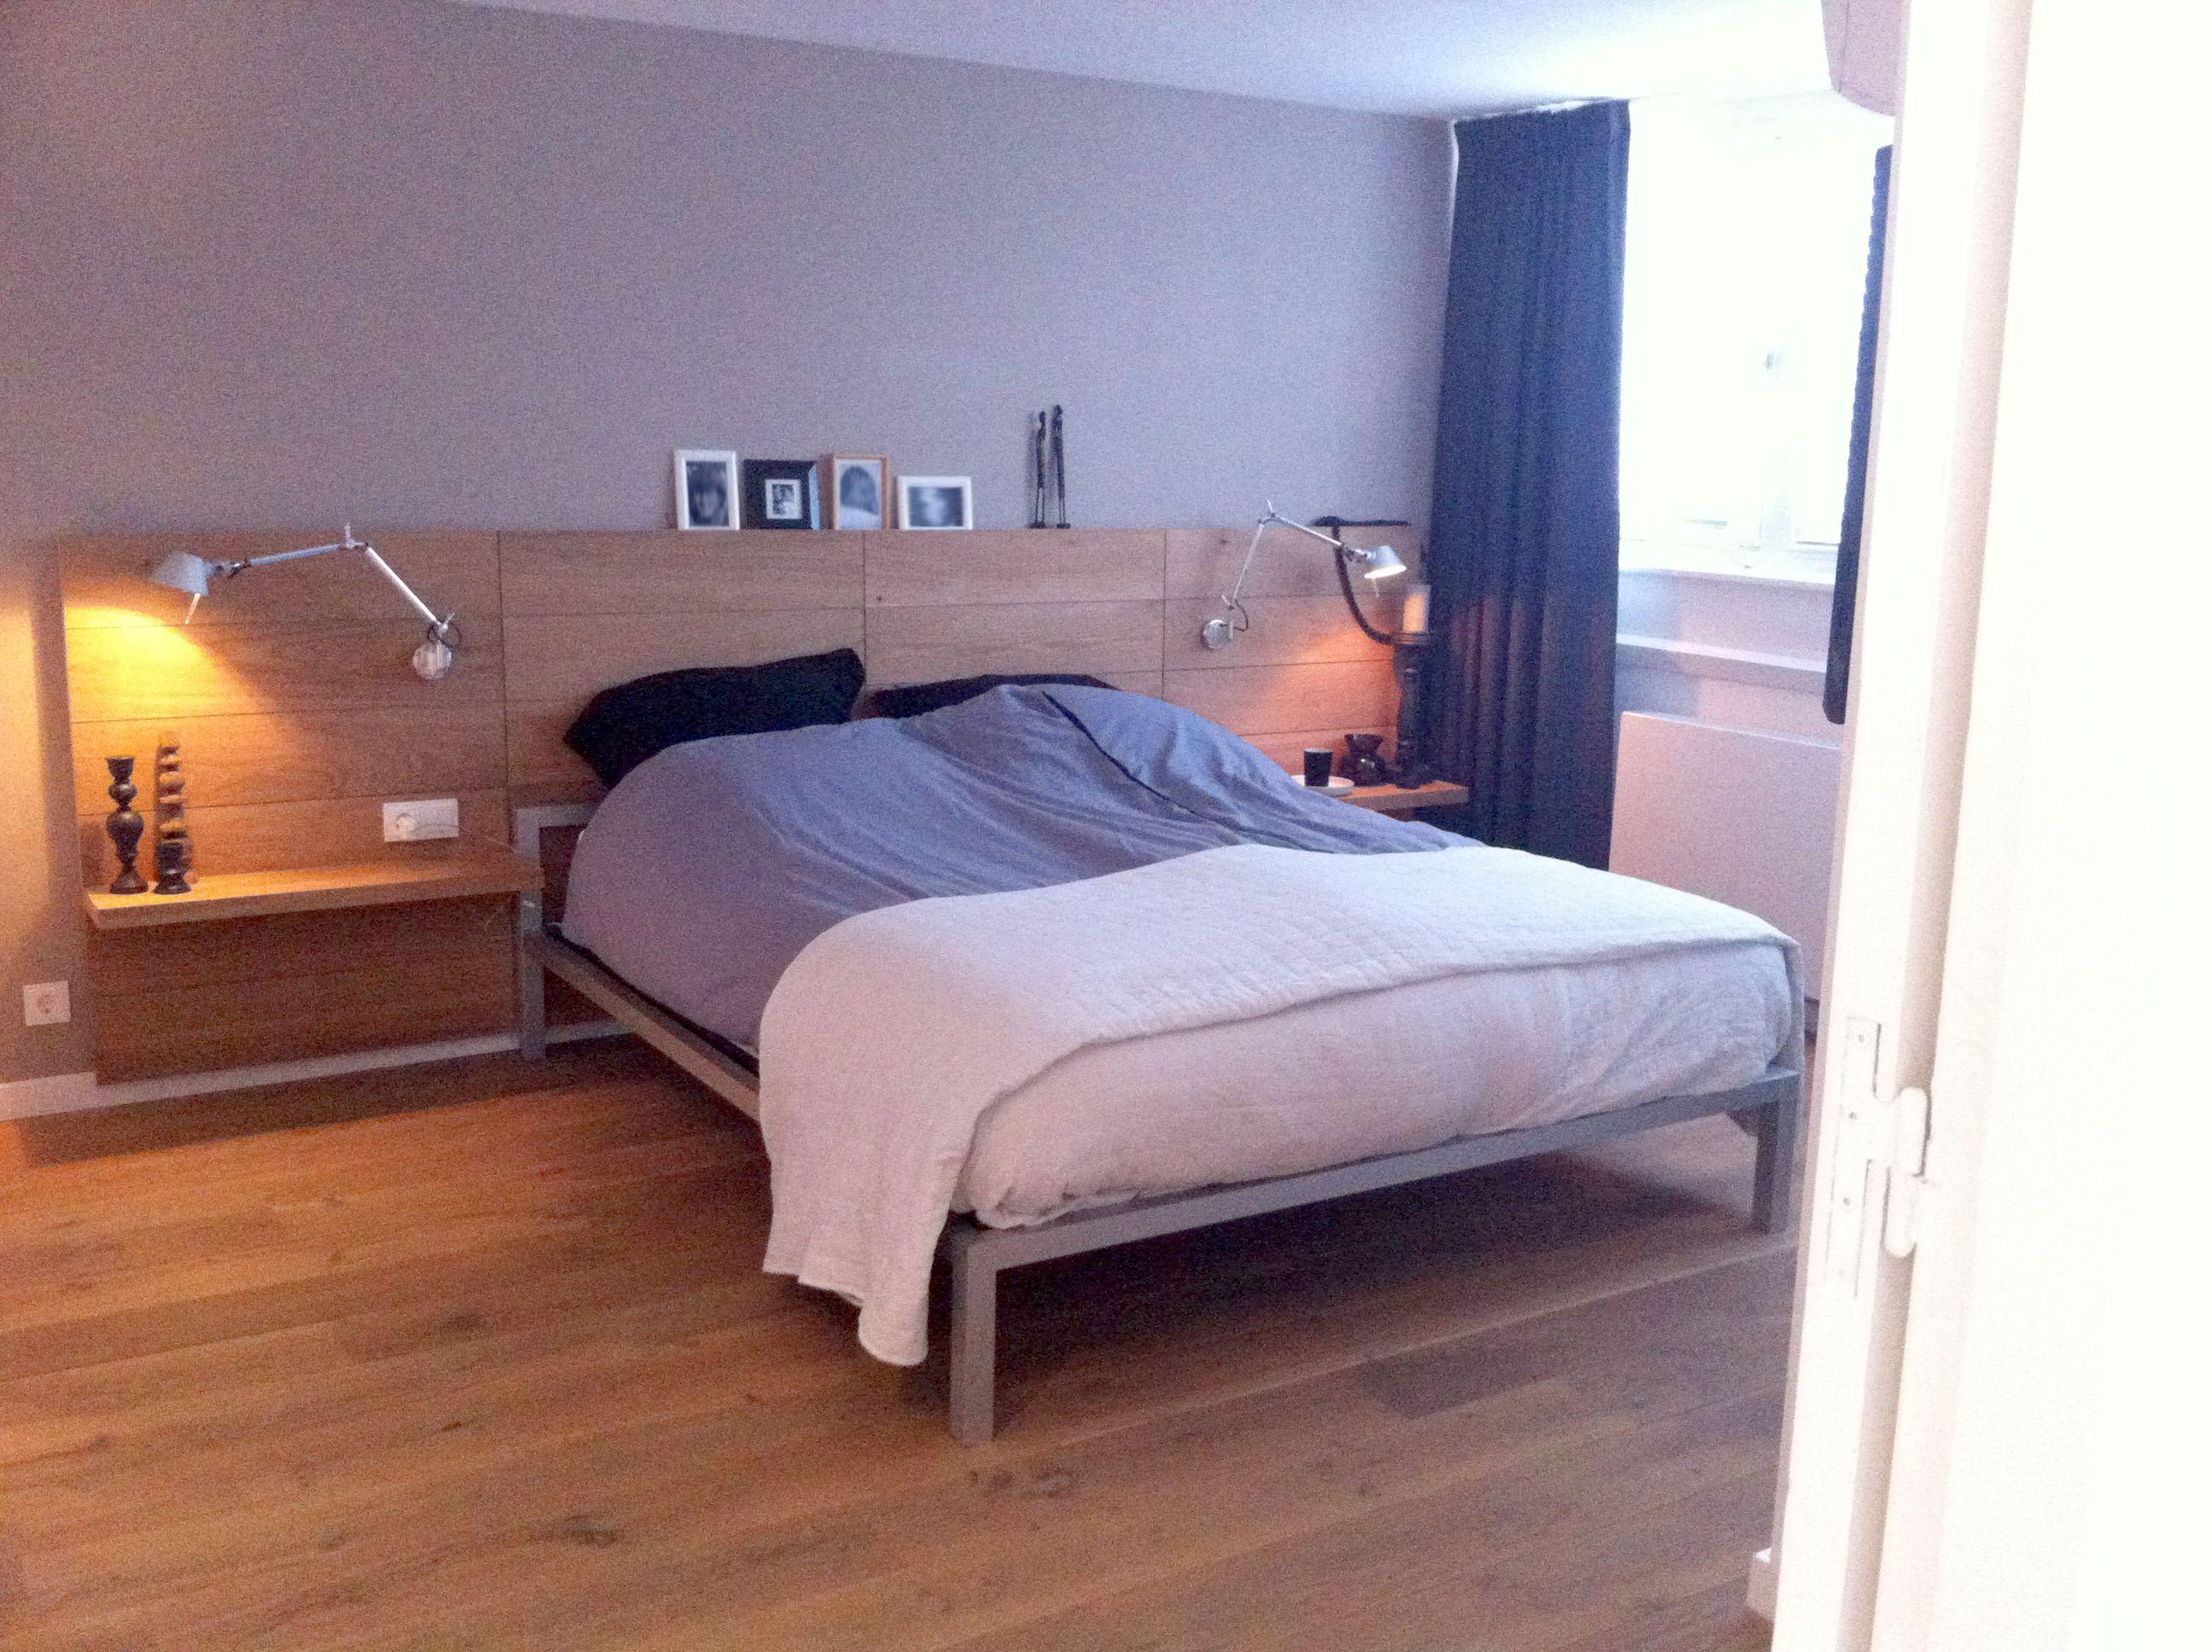 Slaapkamer bedroom hoofdbord headboard eiken hout oak wood